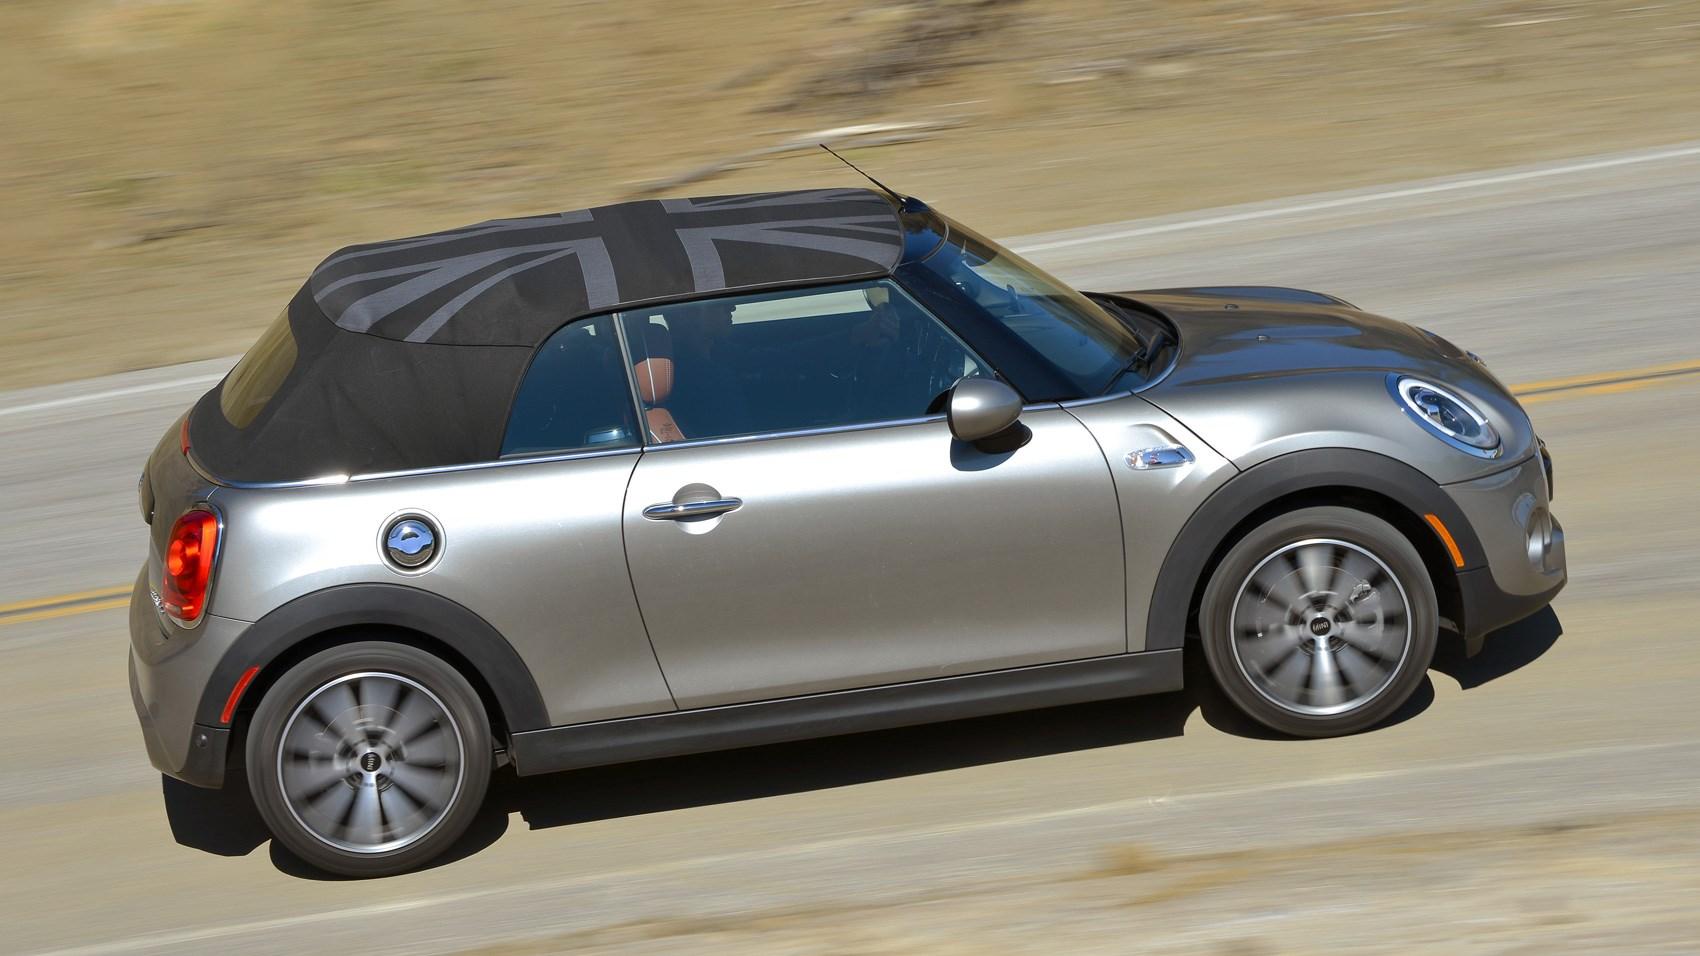 Mini Cooper Cabrio 2016 идеи изображения автомобиля